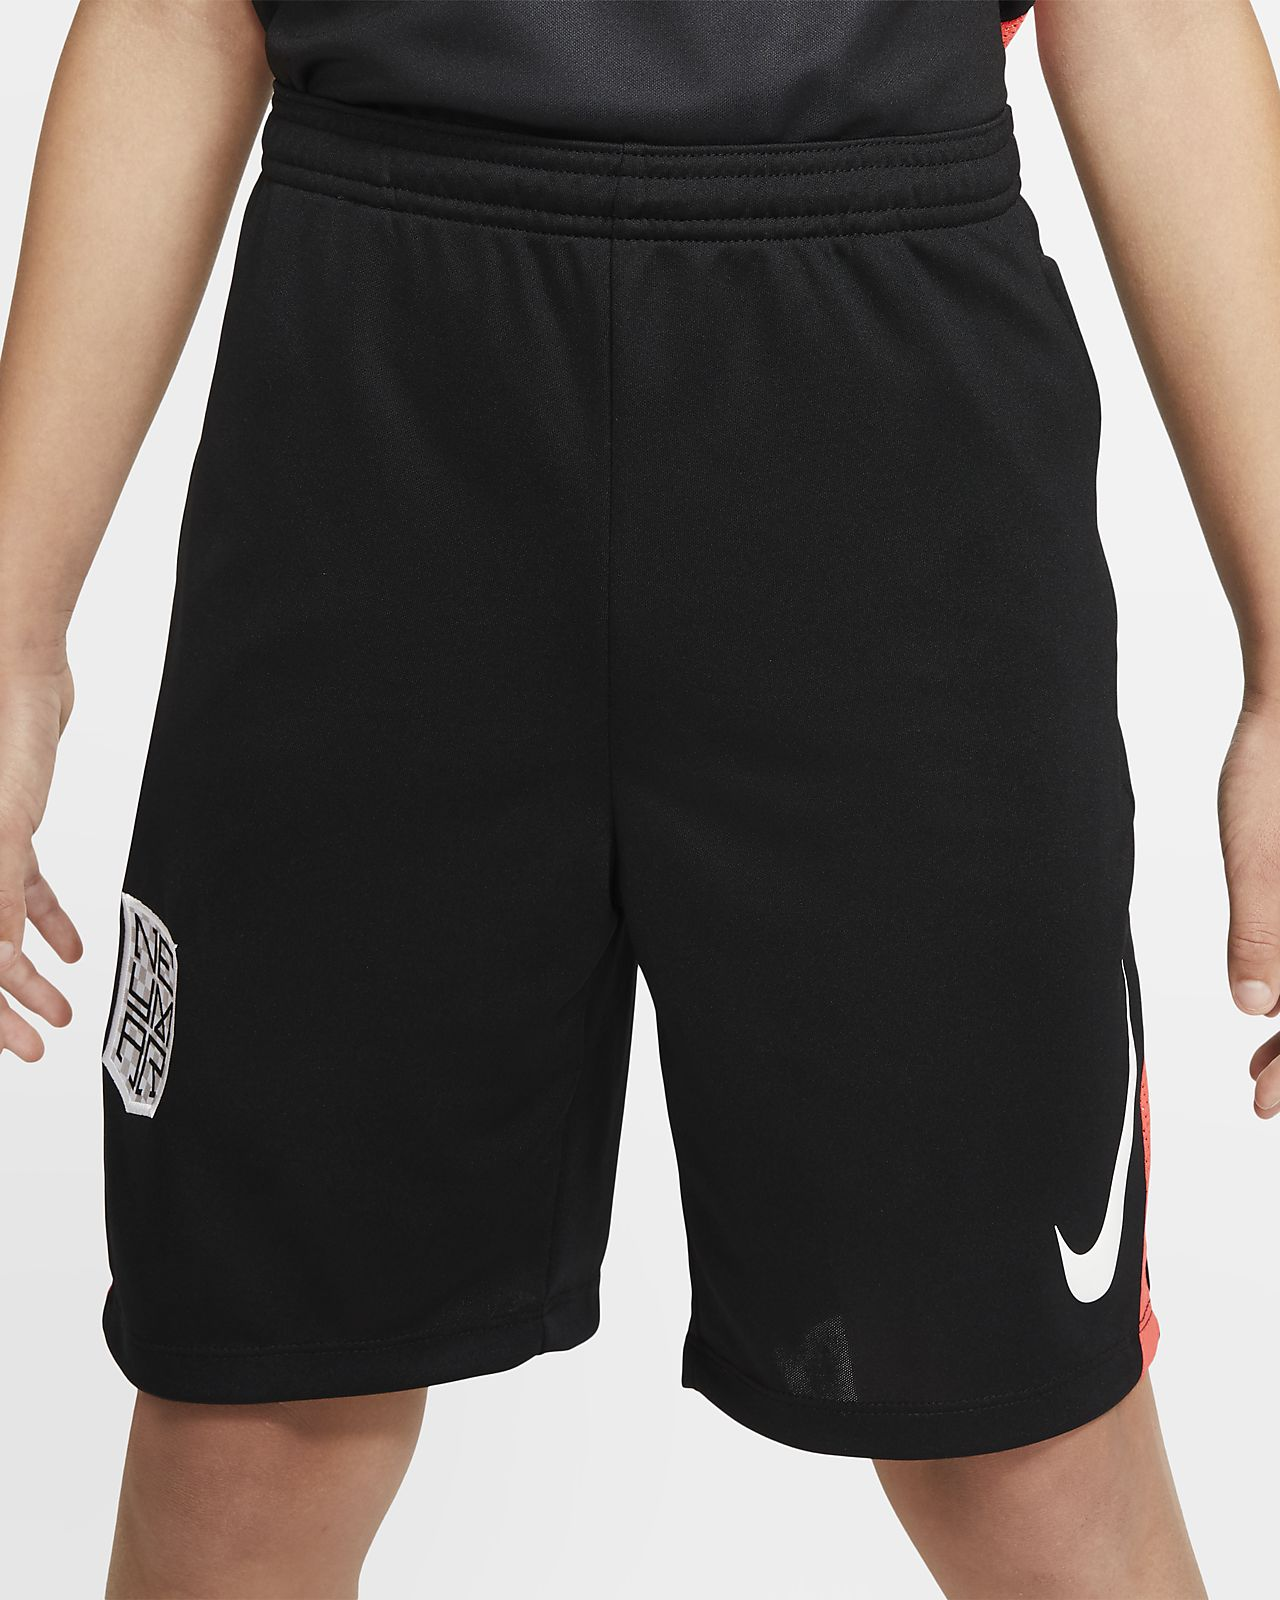 Fotbollsshorts Nike Dri-FIT Neymar Jr. för ungdom